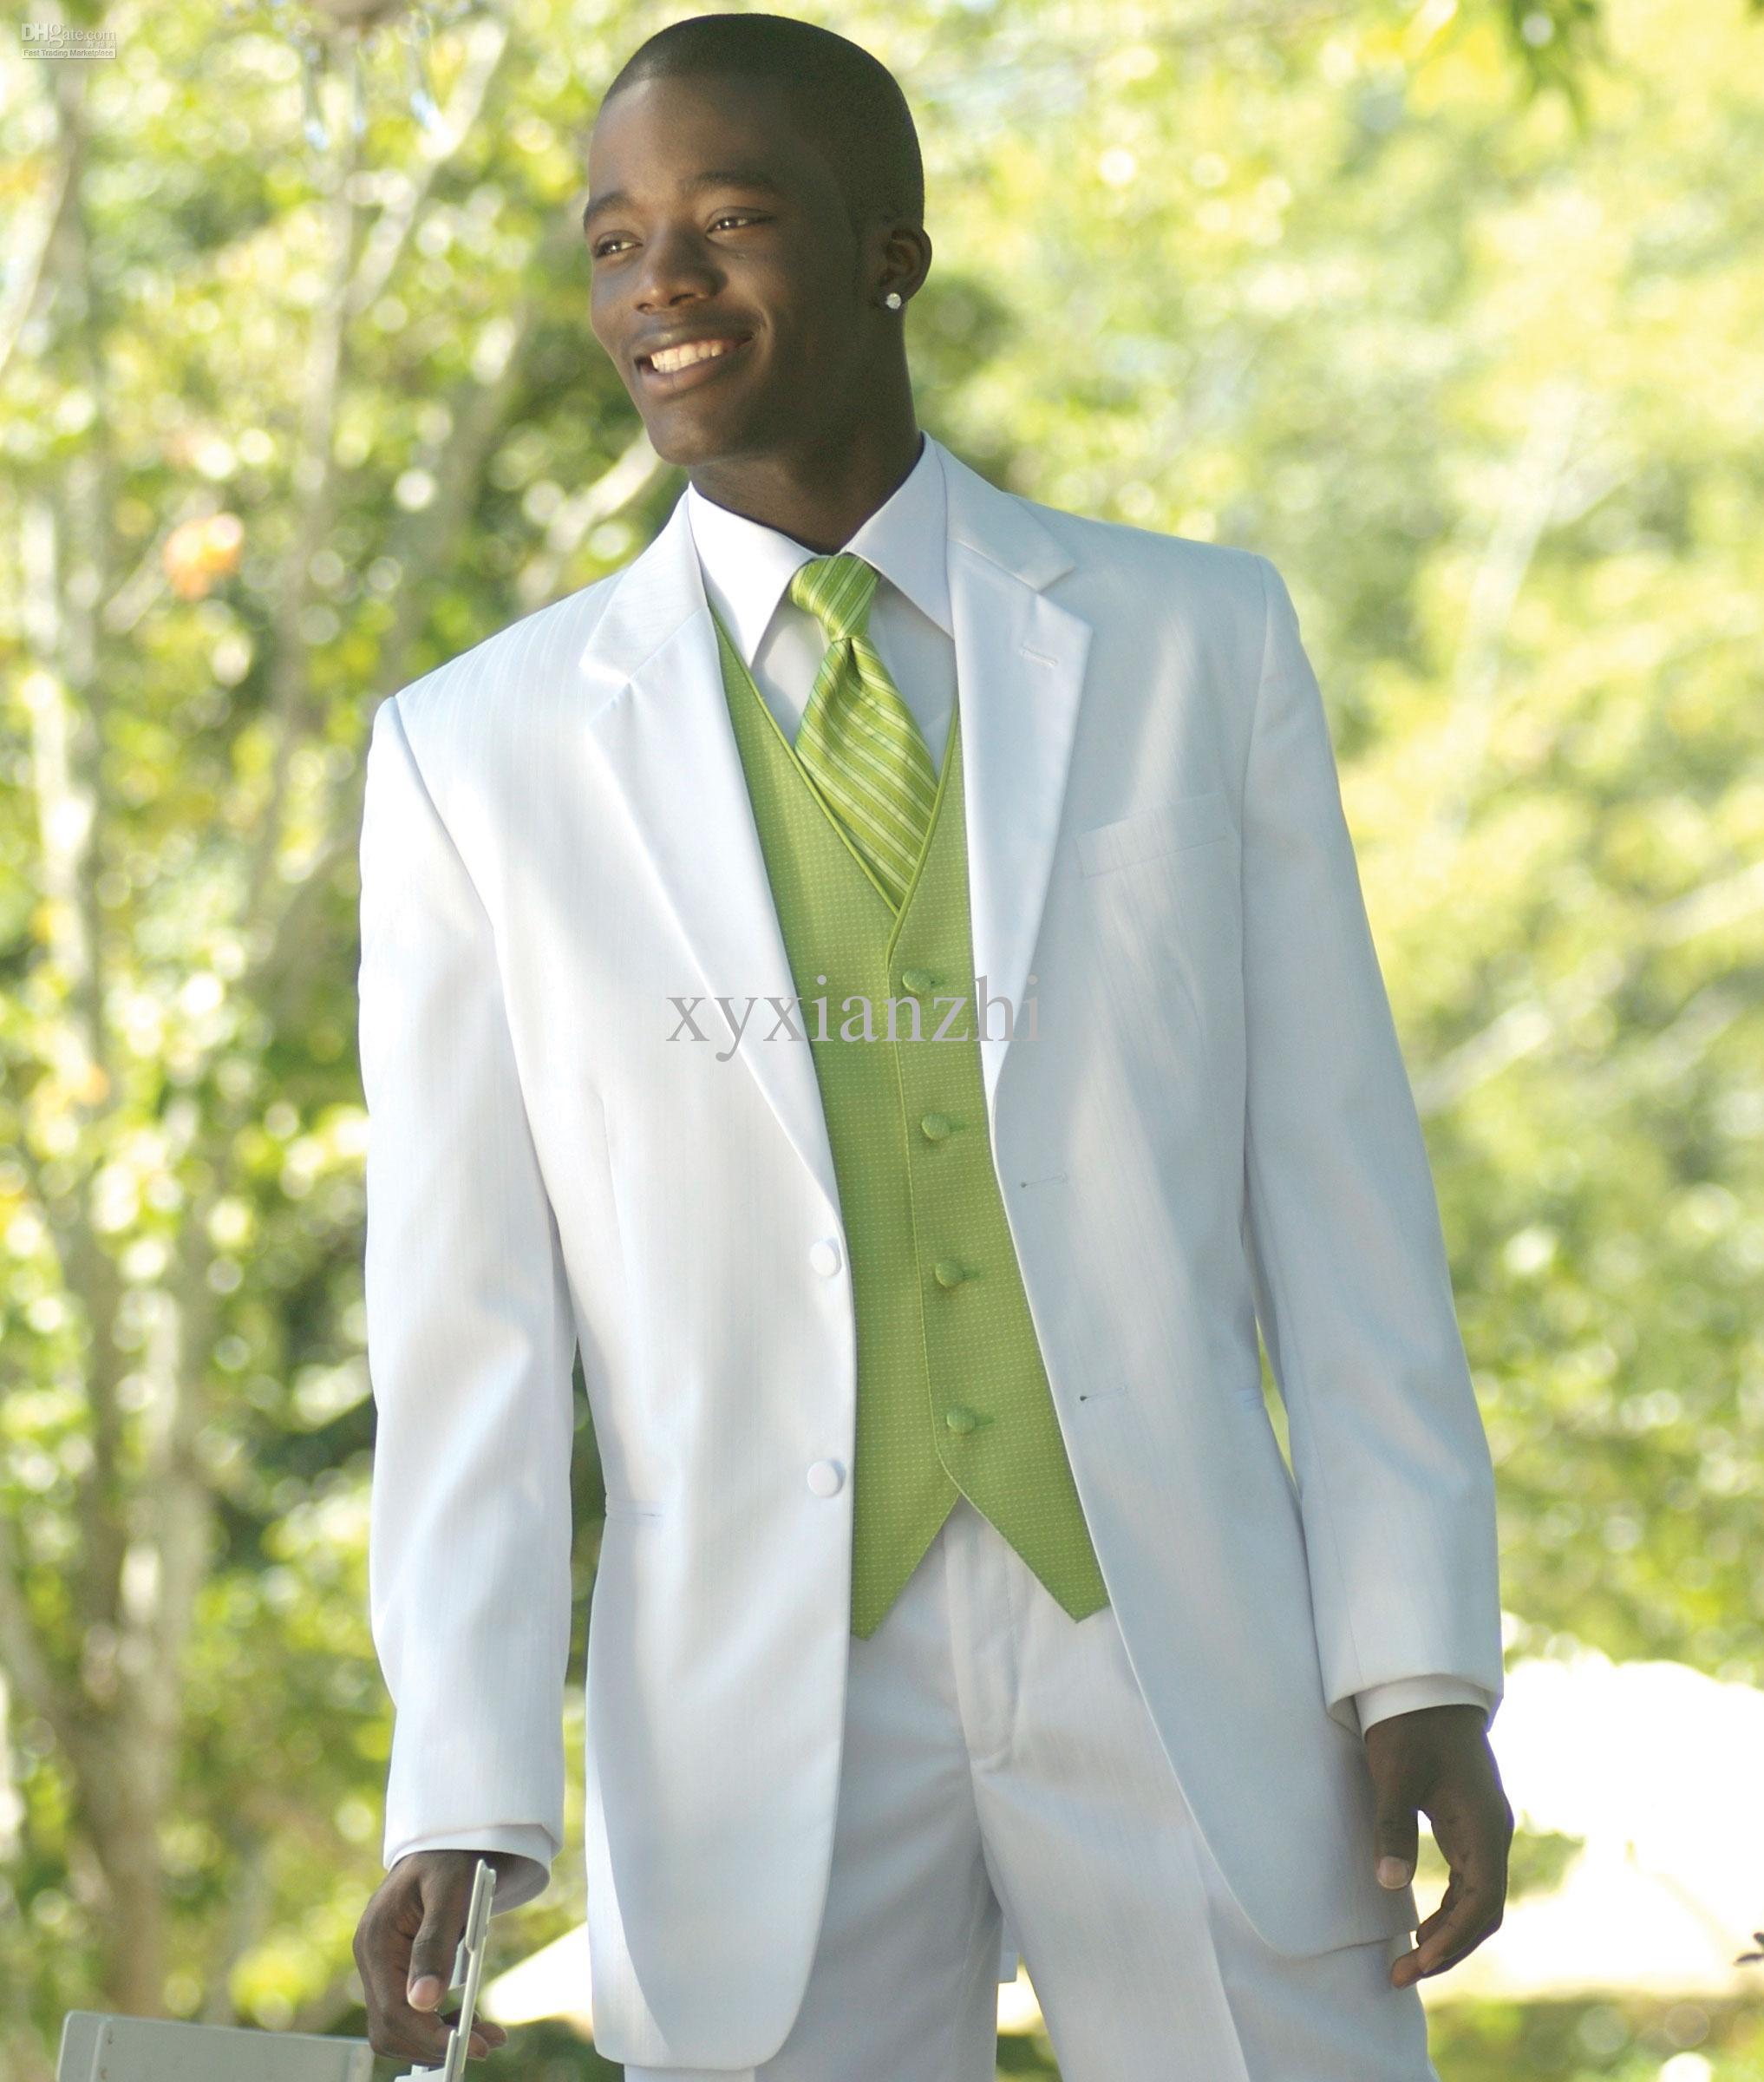 Men's Suits Formal Wear Groom Wedding Tuxedo for Men Suit White ...